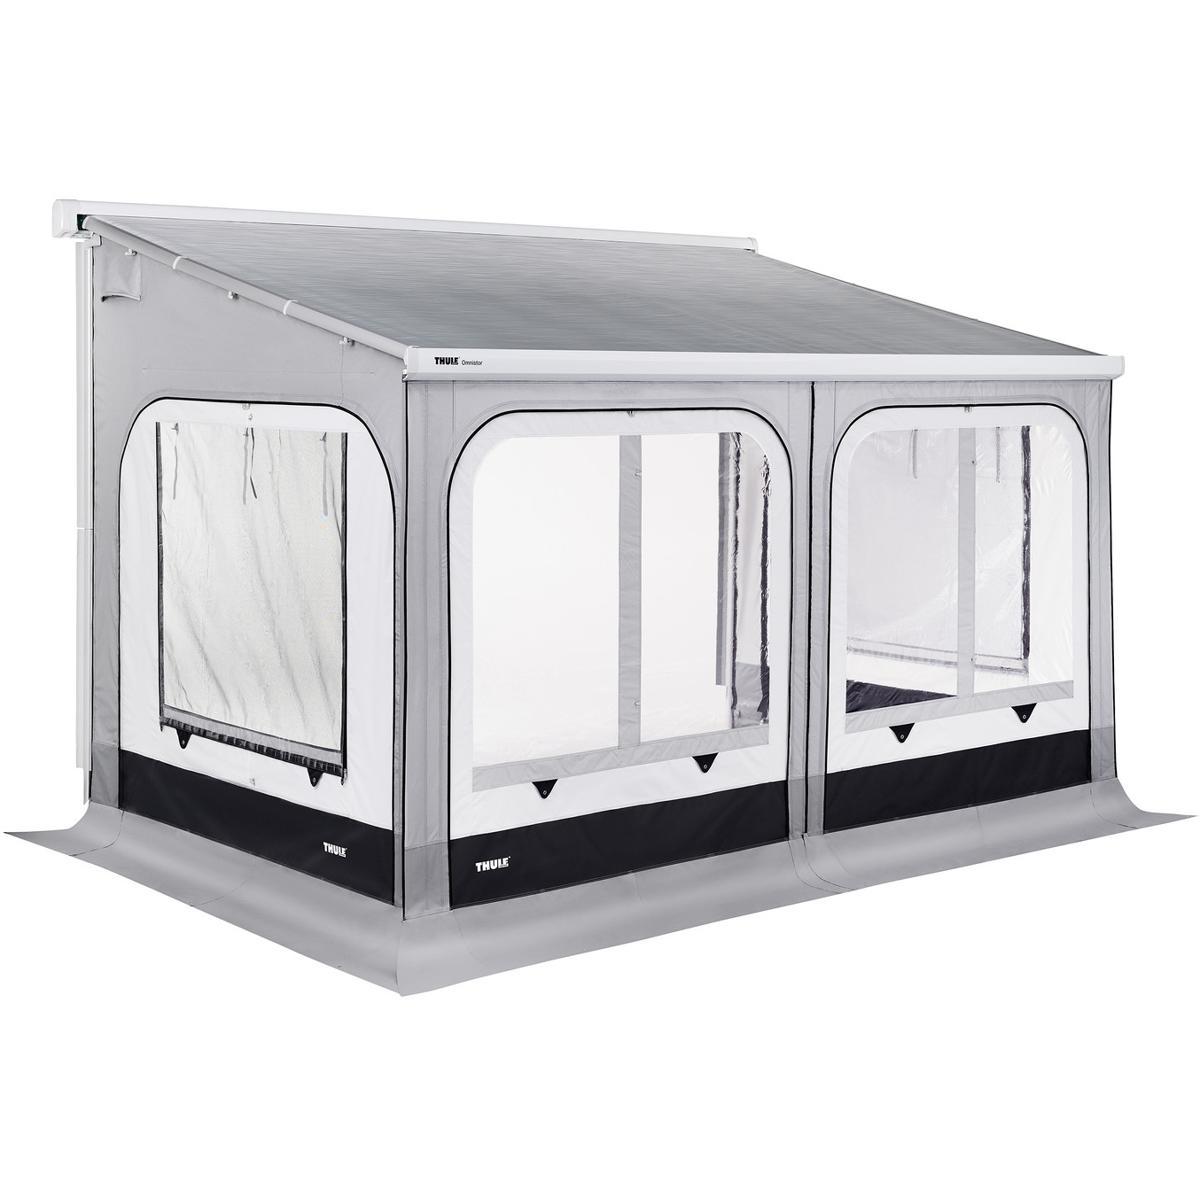 thule omnistor safari panorama markisen vorzelt typ 5003 350cm 230 244cm von thule omnistor. Black Bedroom Furniture Sets. Home Design Ideas